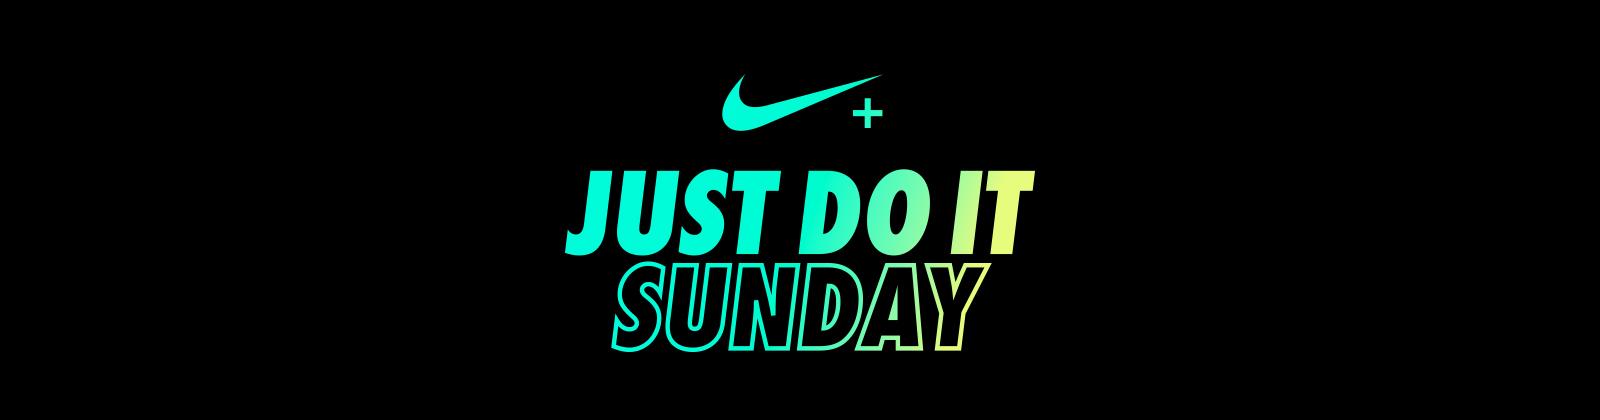 302436db2f JUST DO IT SUNDAY | Nike